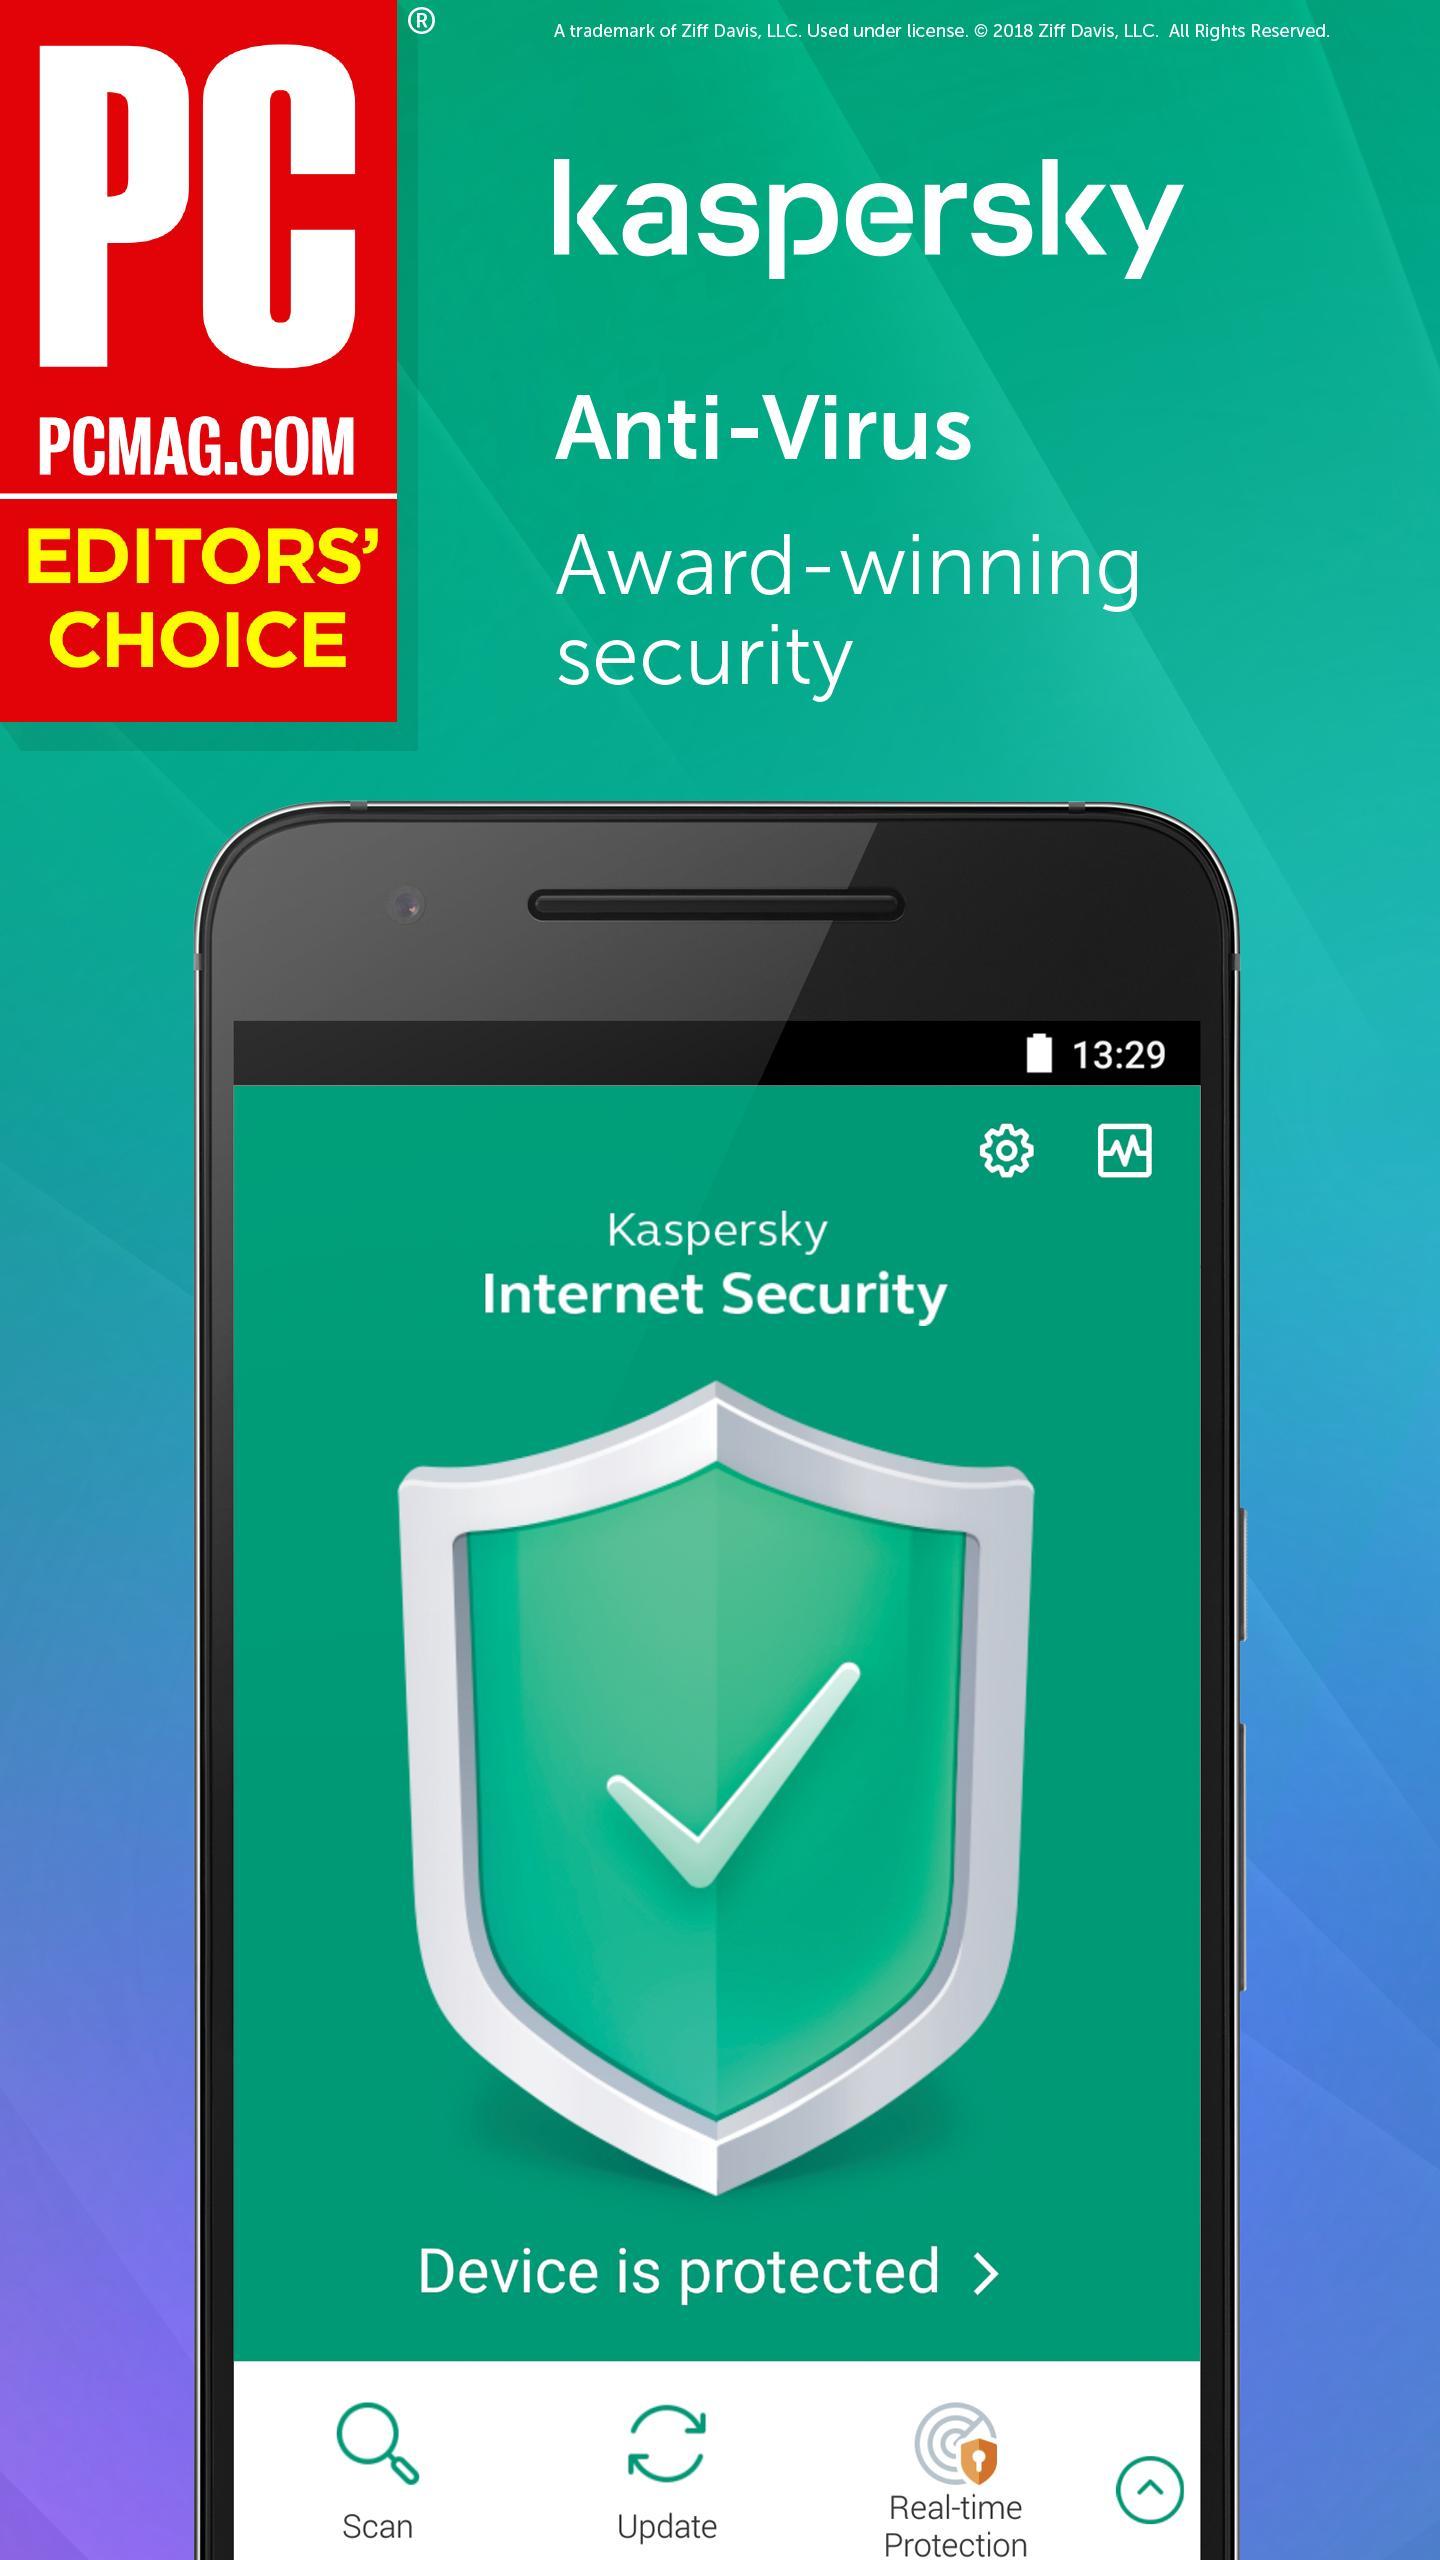 kaspersky mobile security antivirus